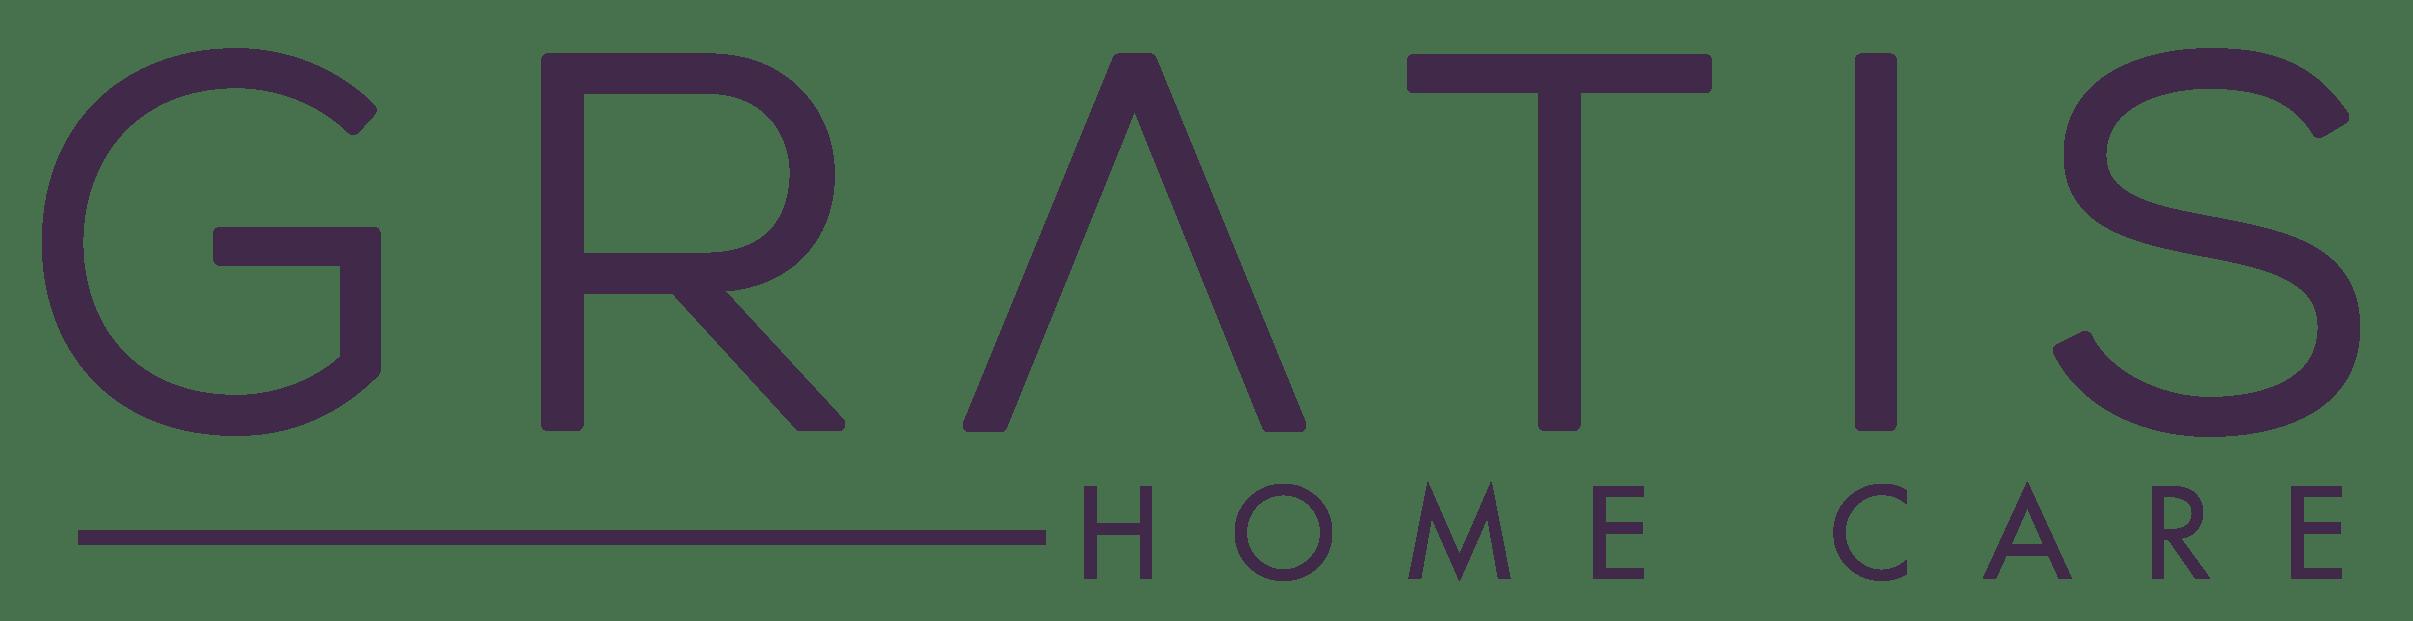 Gratis Home Care